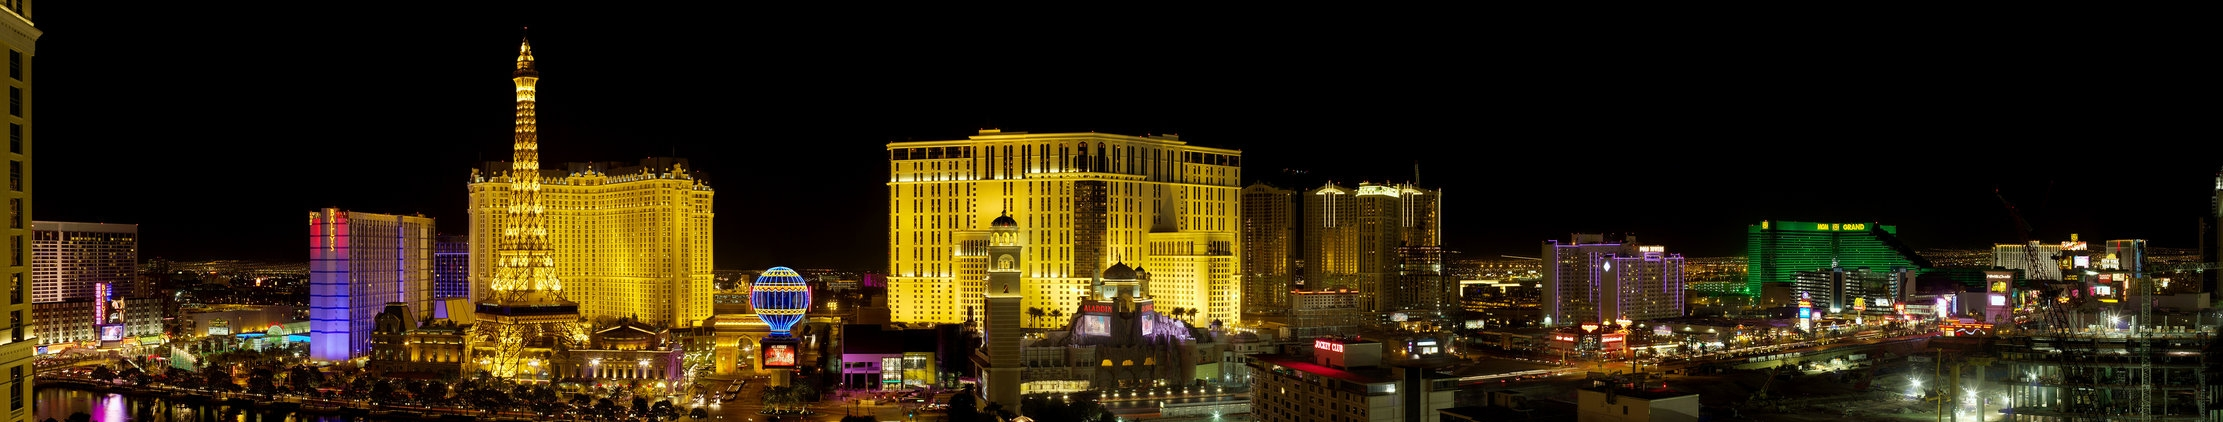 Las Vegas to Flagstaff Shuttle